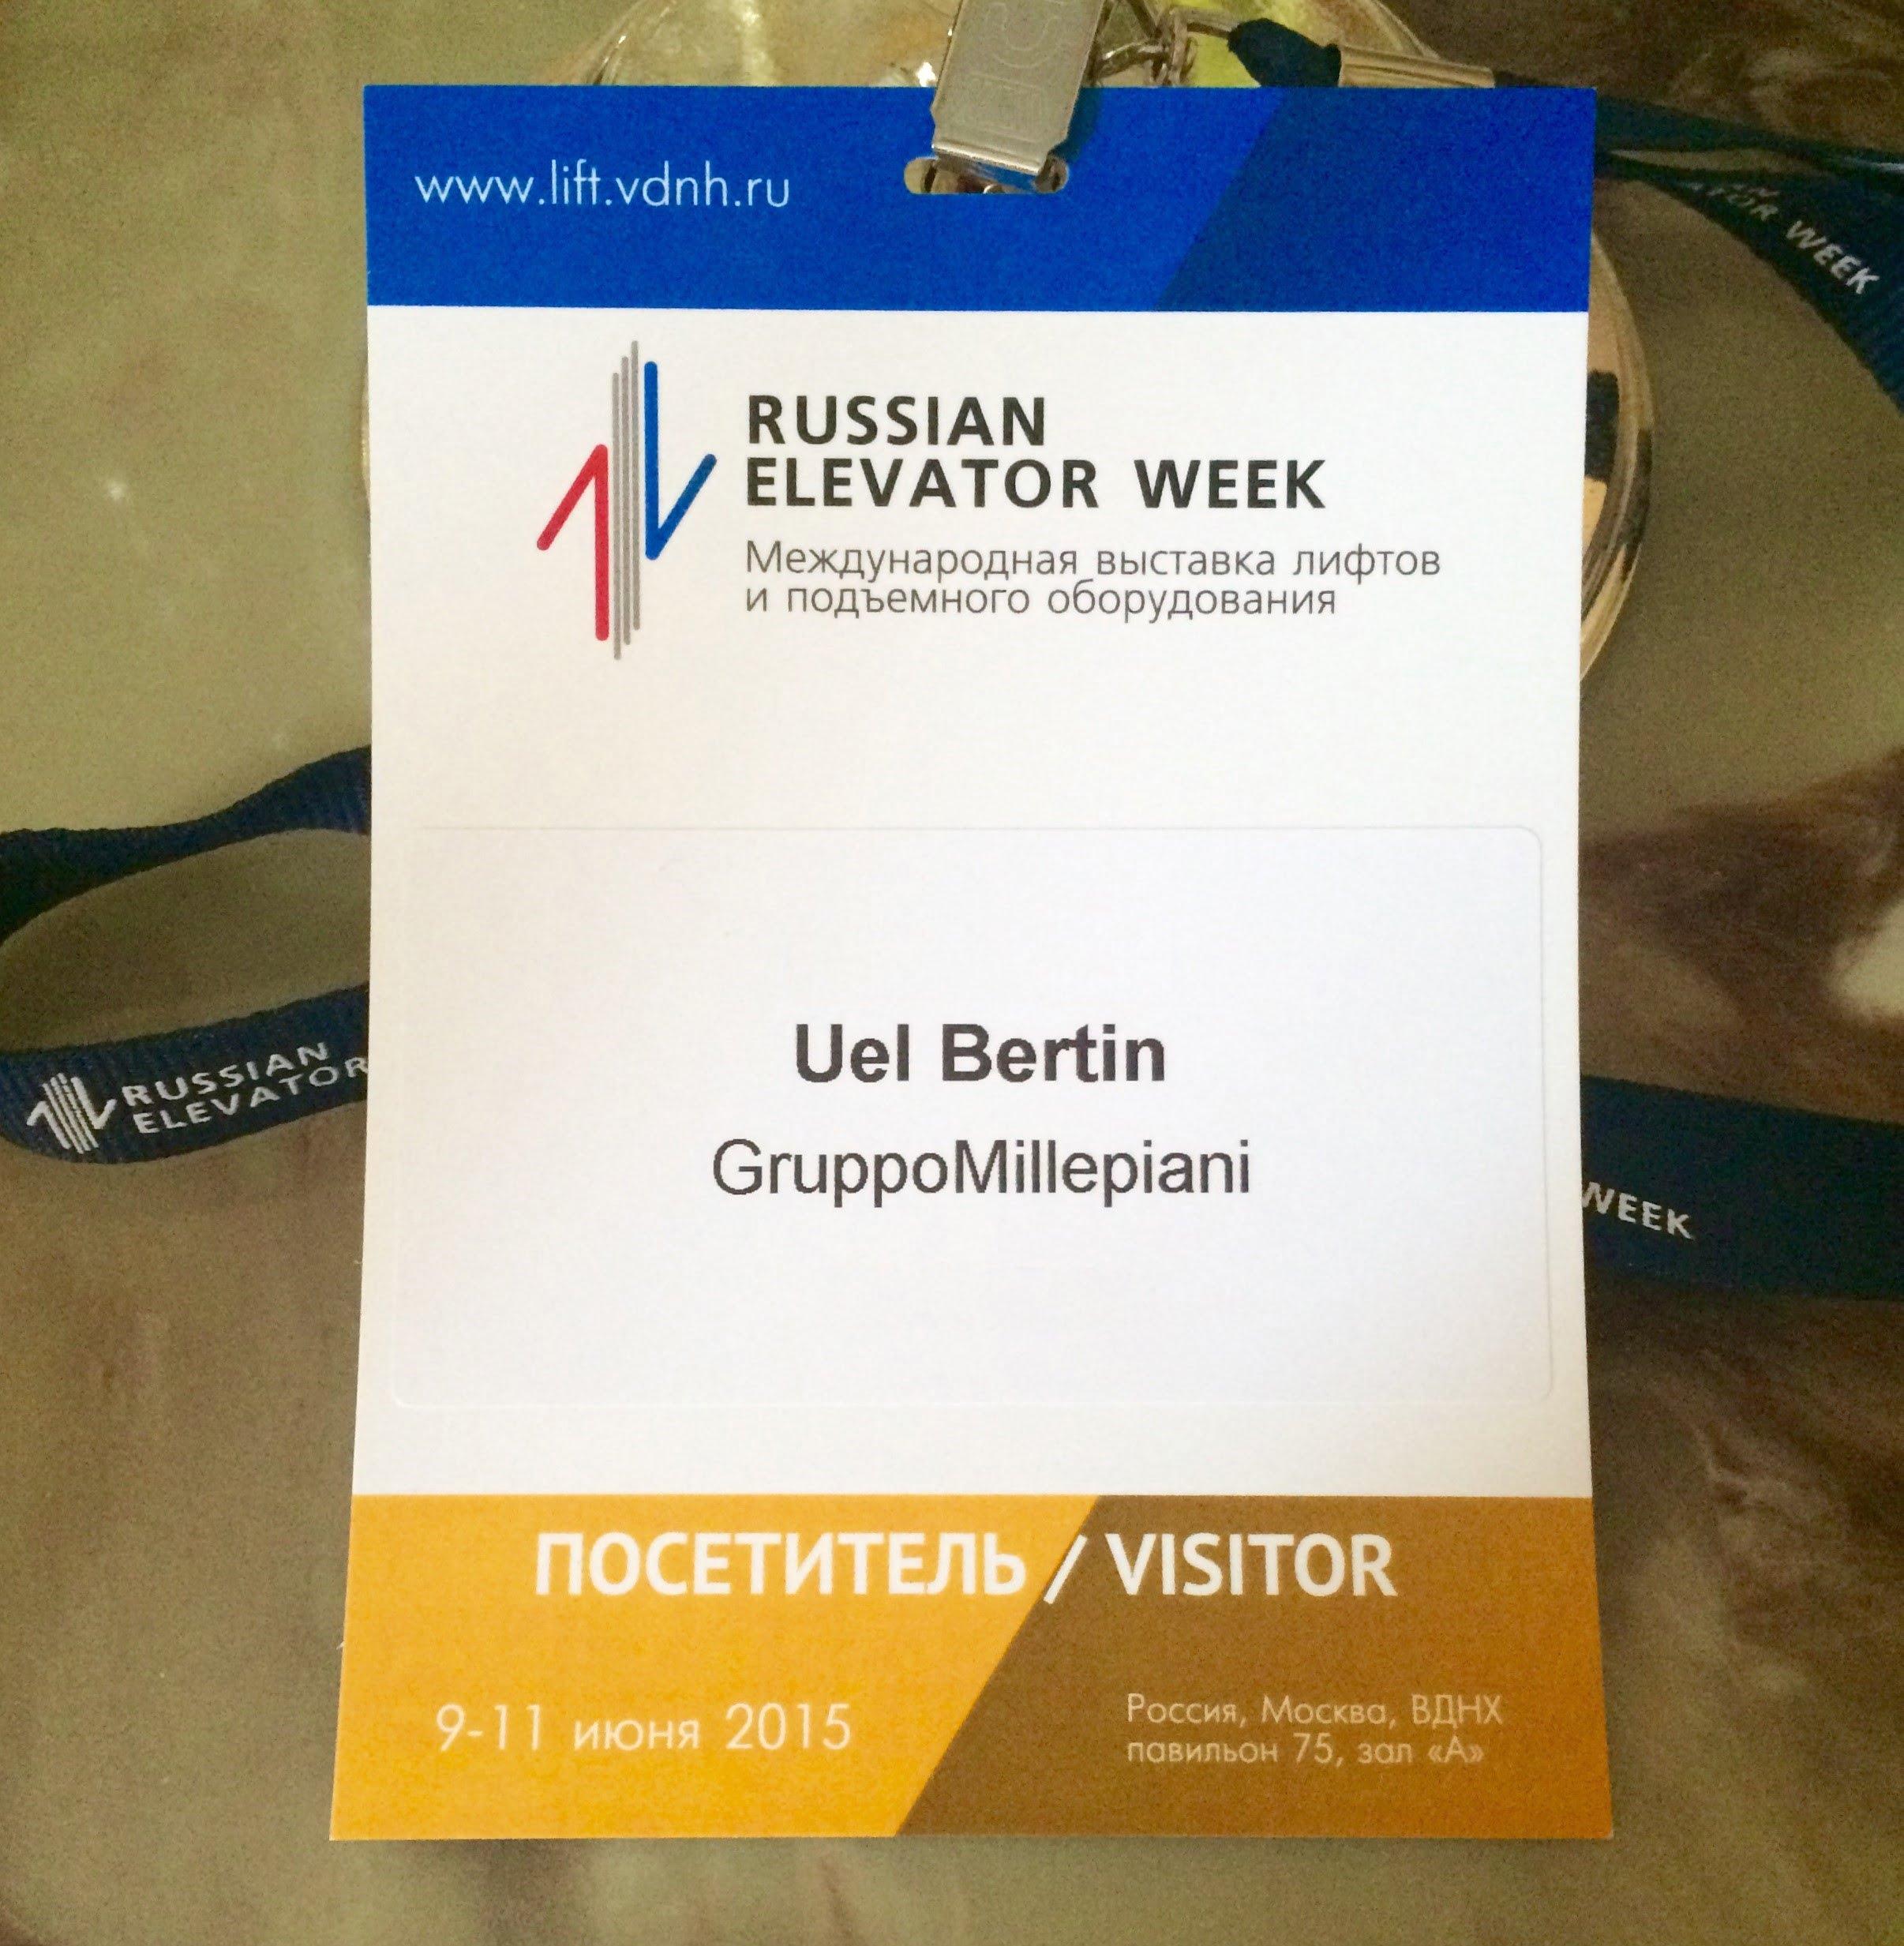 Russian-Elevator-Week-2